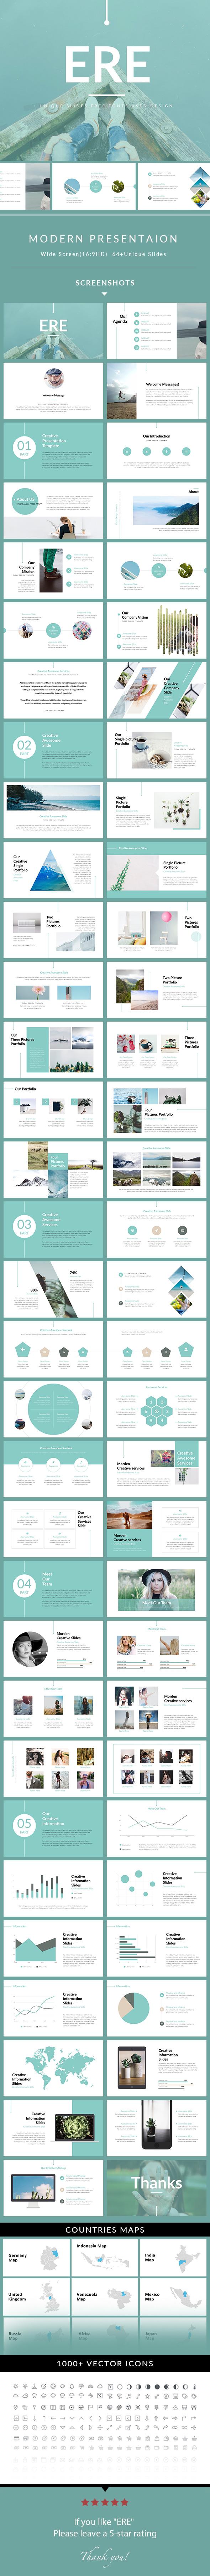 ERE - Modern PowerPoint Template - Creative PowerPoint Templates